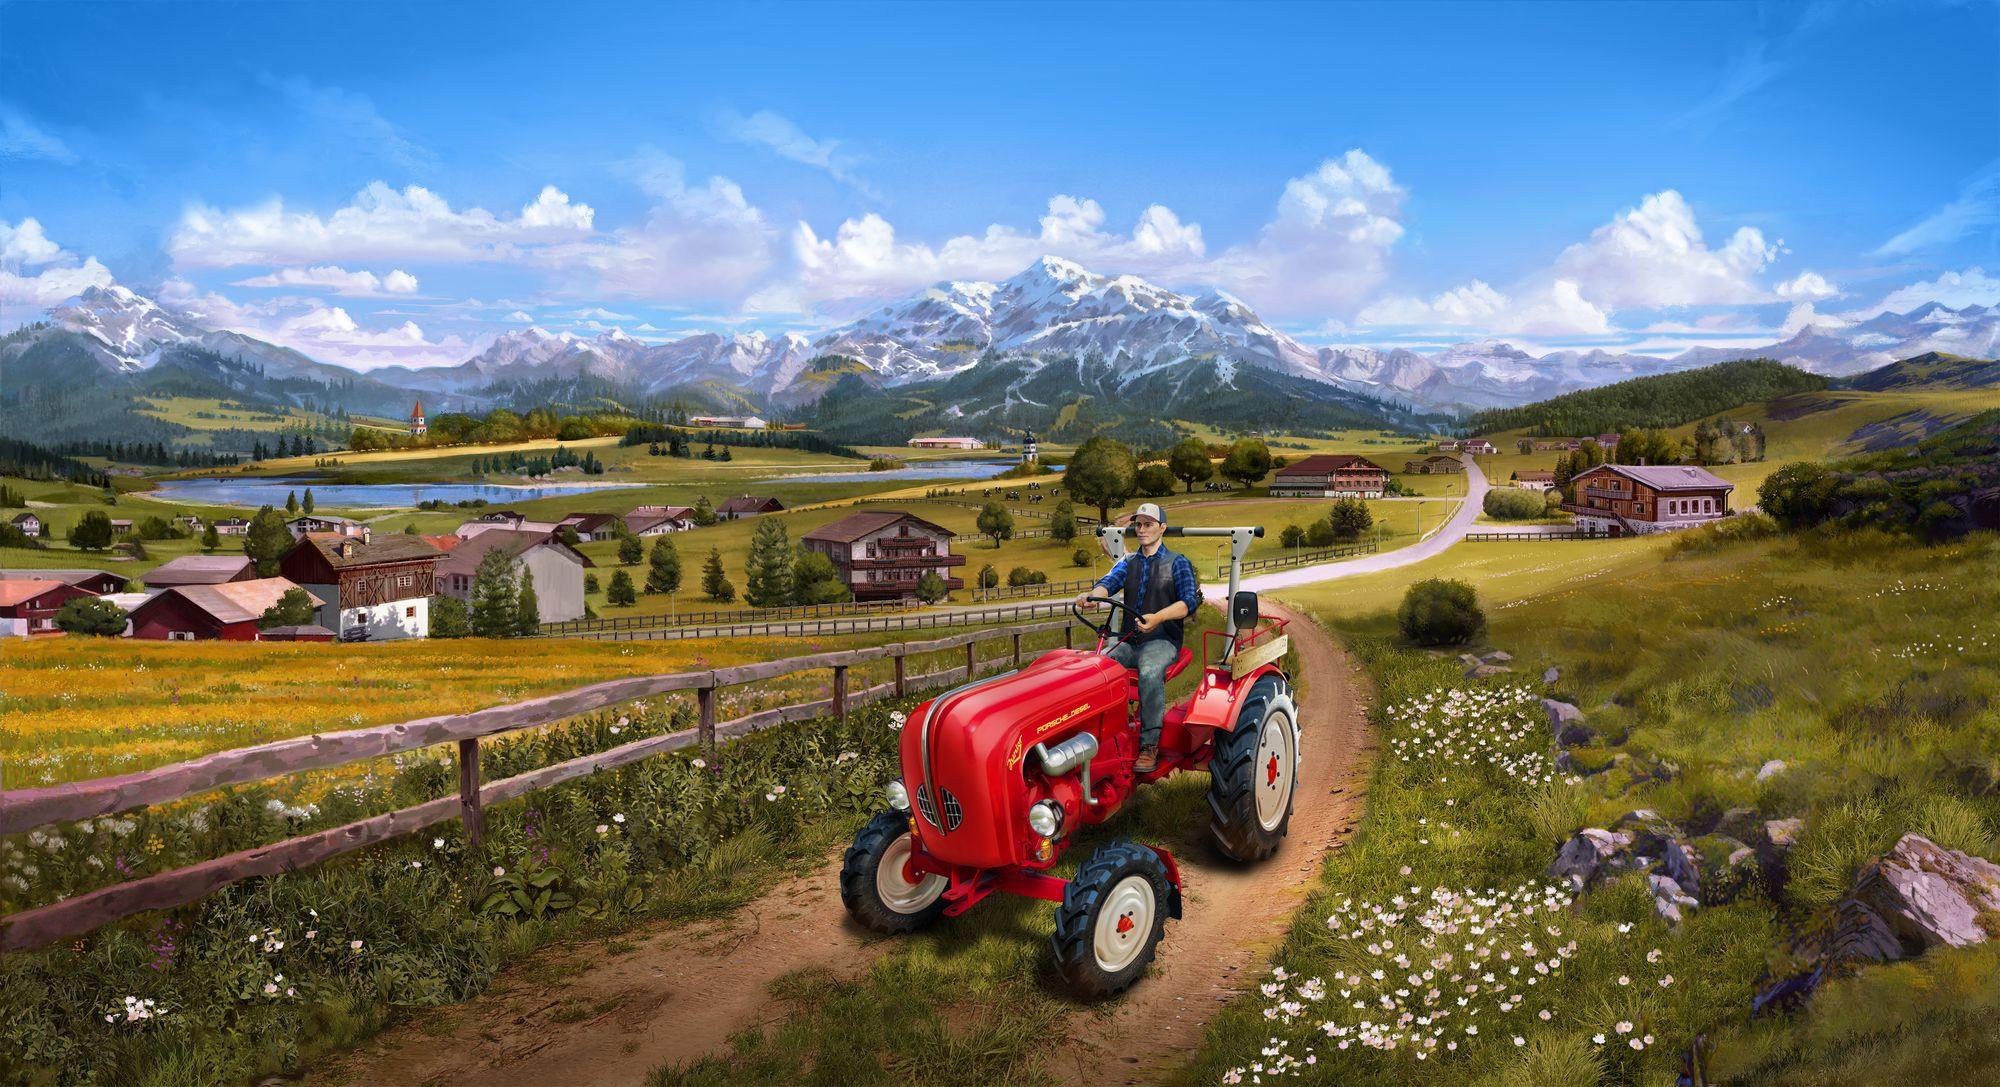 Revell-07823-Easy-Click_Porsche-Junior-108-Farming-Simulator-Edition Revell Neuheiten 2021